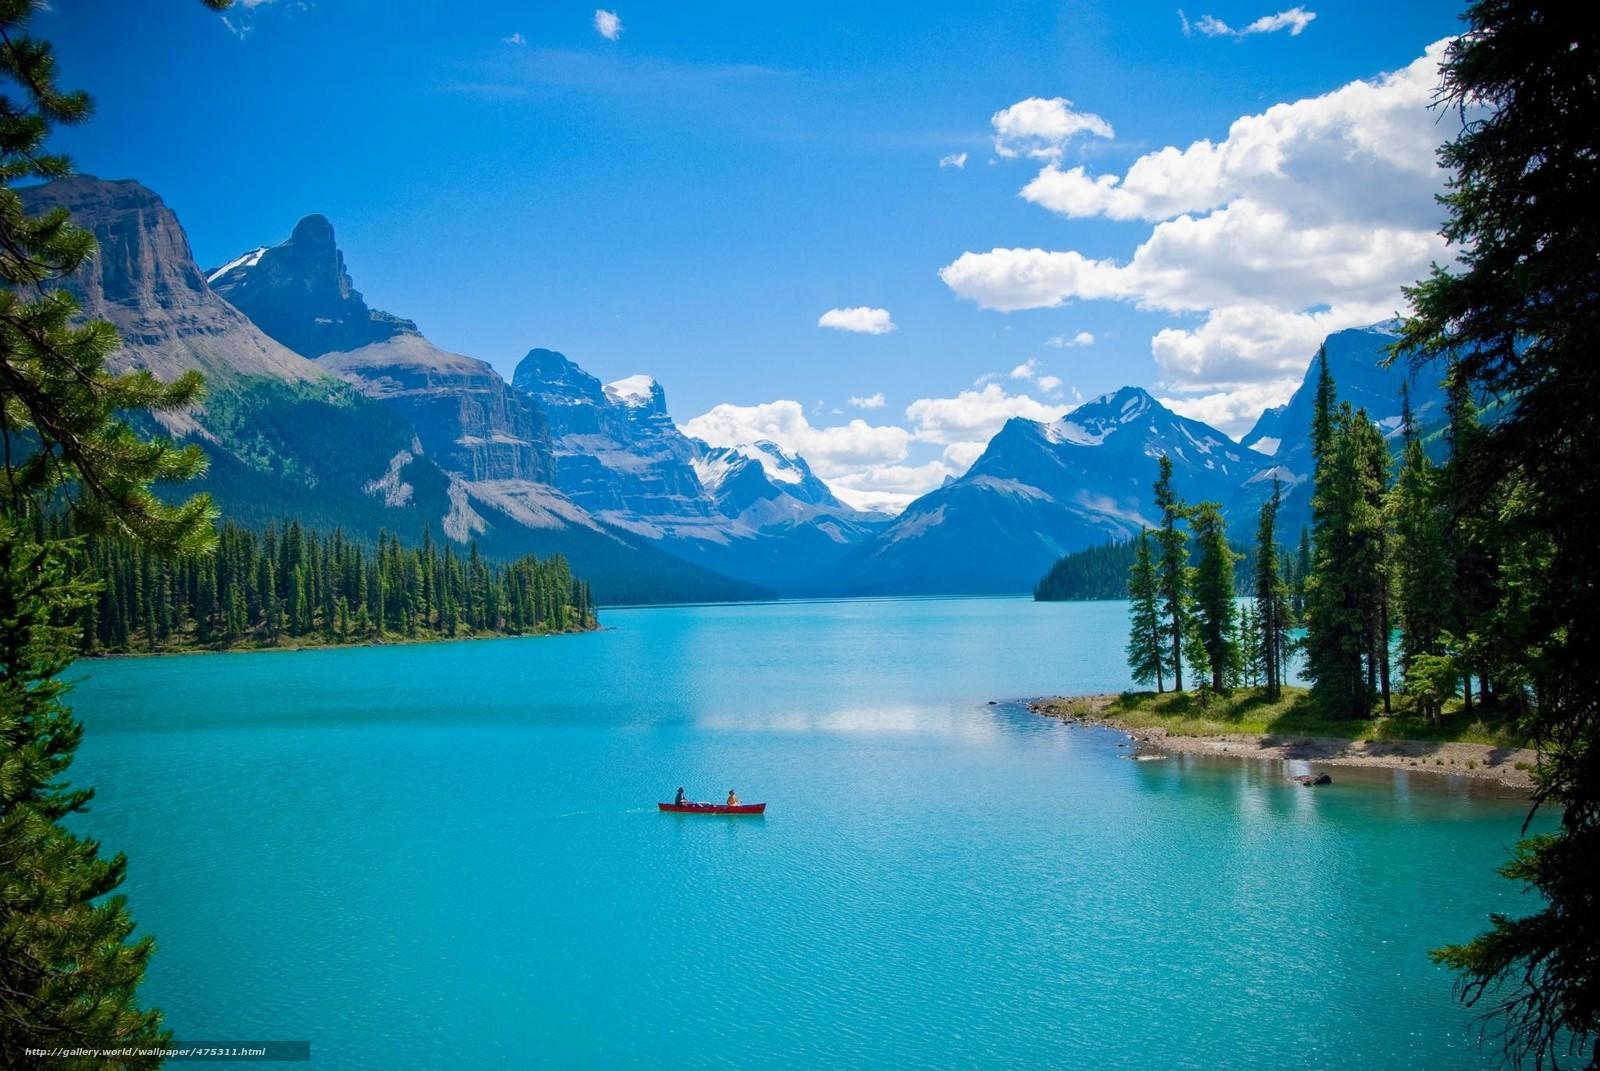 Scenery wallpaper fond d 39 cran paysage canada for Fonds ecran paysages superbes